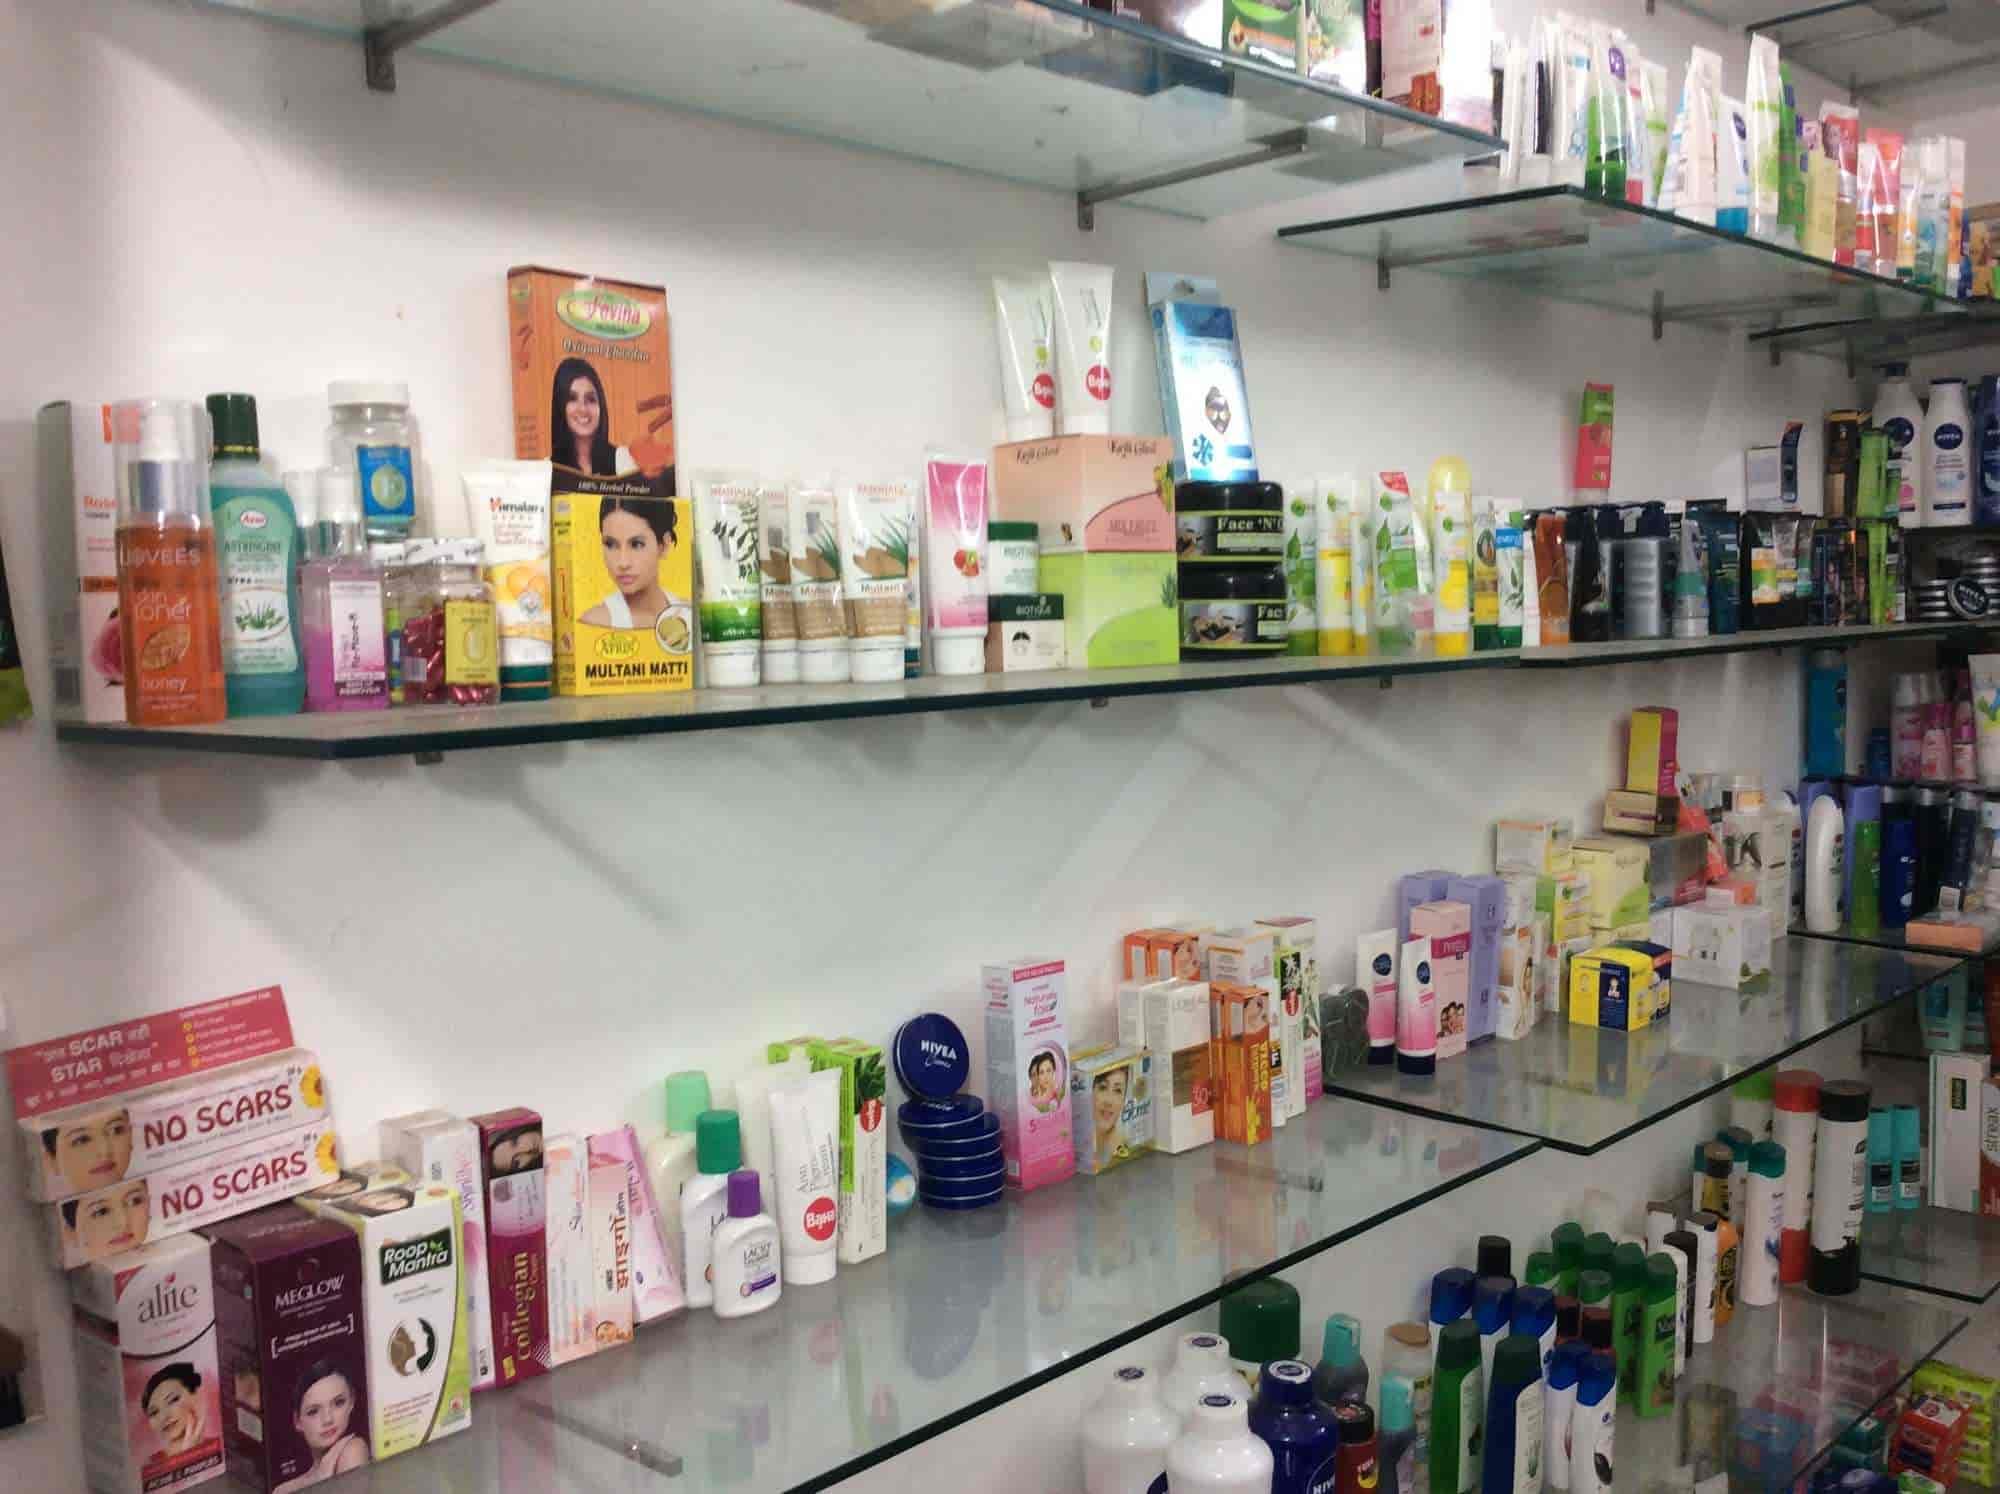 Cosmo Care Photos Deen Dayal Upadhyay Nagar Raipur Chhattisgarh Vk Foaming Dew Cosmetic Dealers